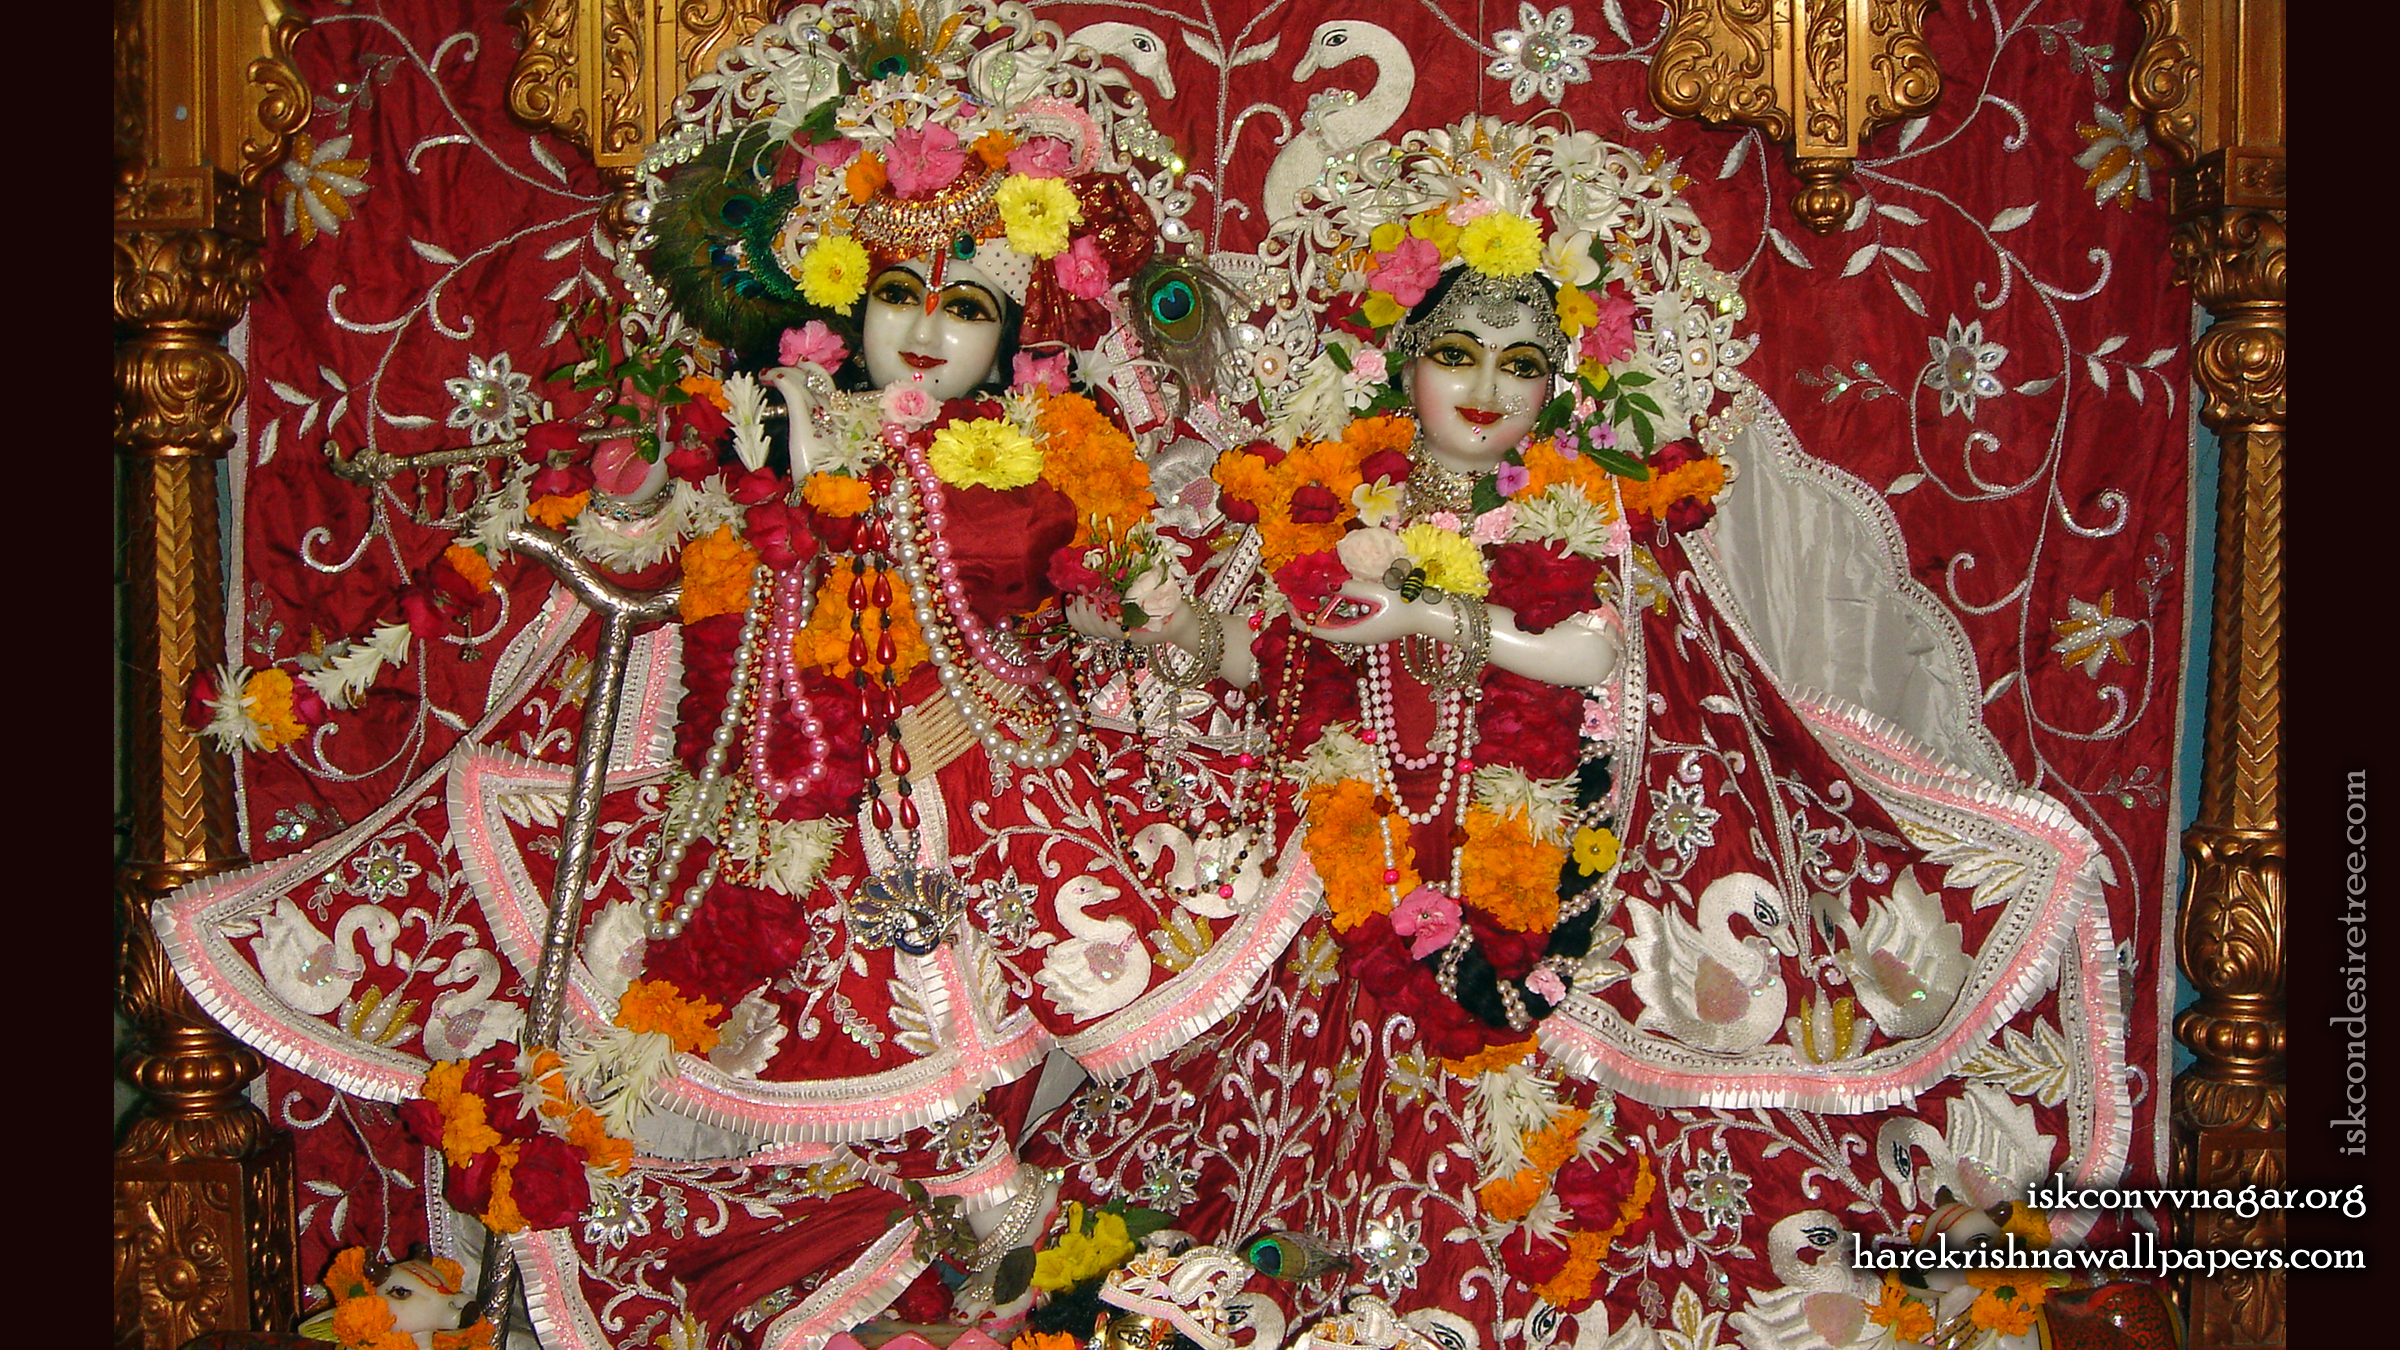 Sri Sri Radha Giridhari Wallpaper (012) Size 2400x1350 Download